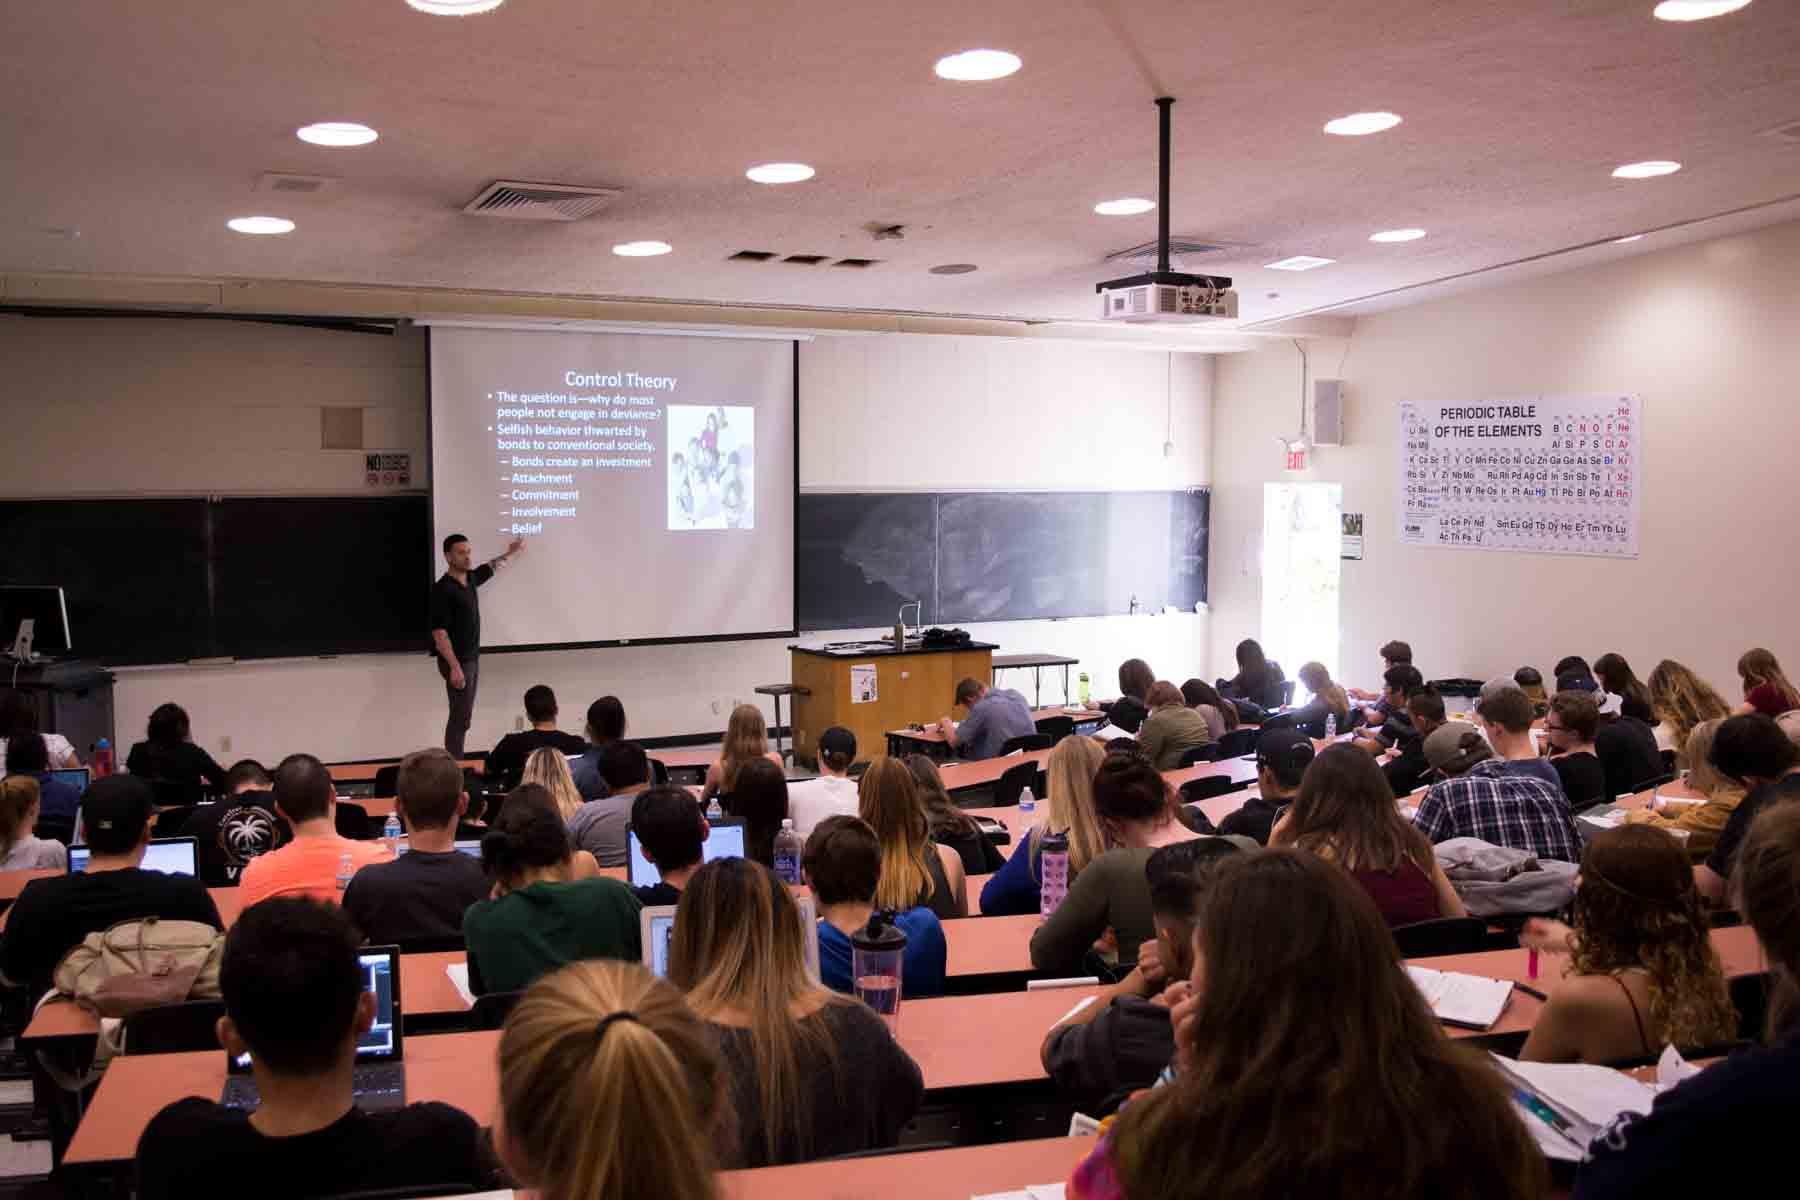 Sociology Professor Dr Patrick OBrien Lectures With A Laid Back Technique That